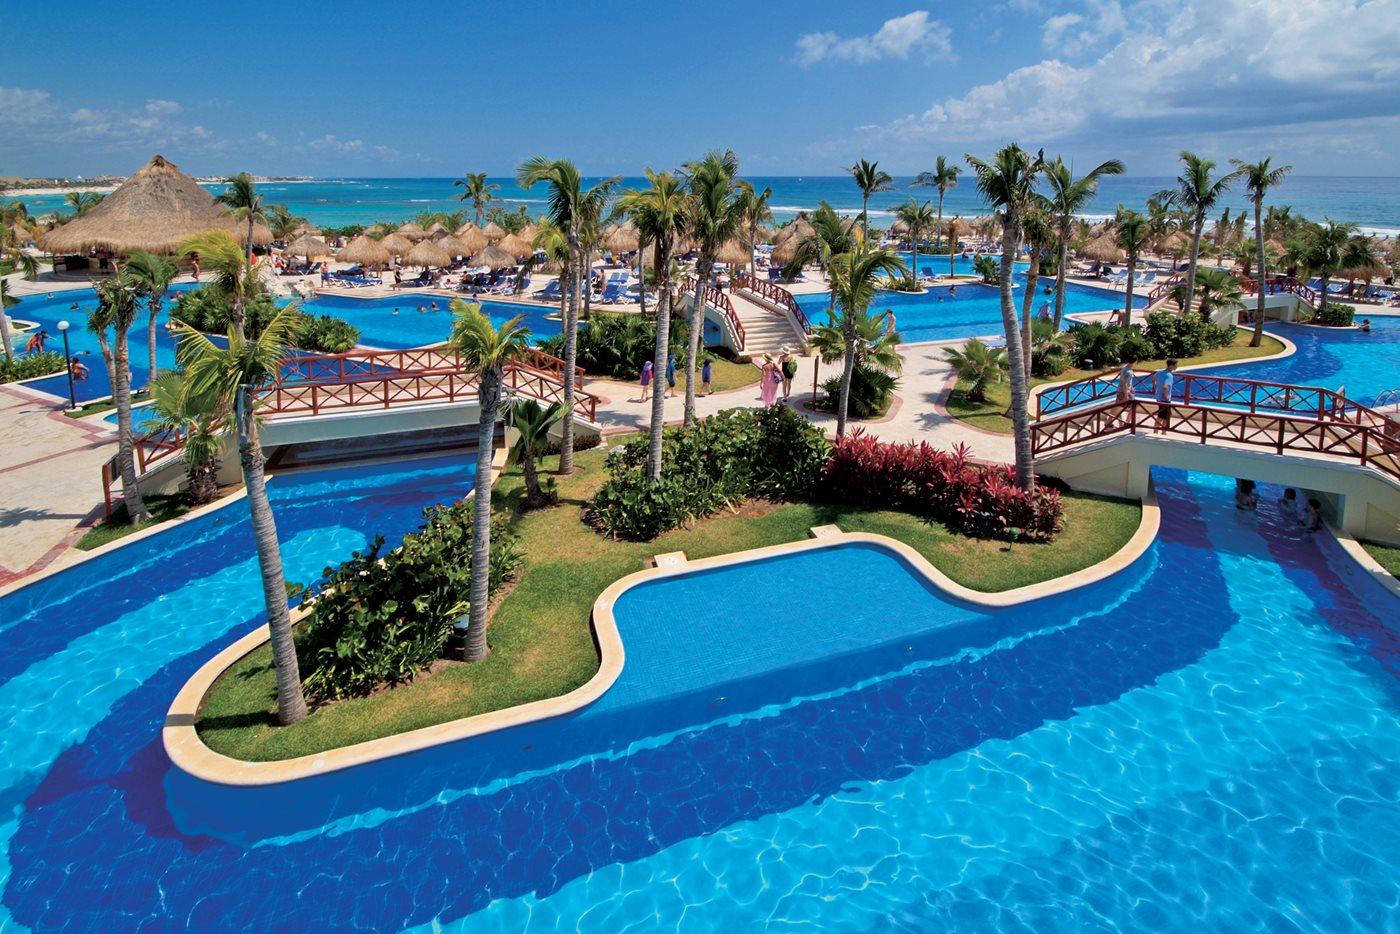 Luxury Bahia Principe Aal